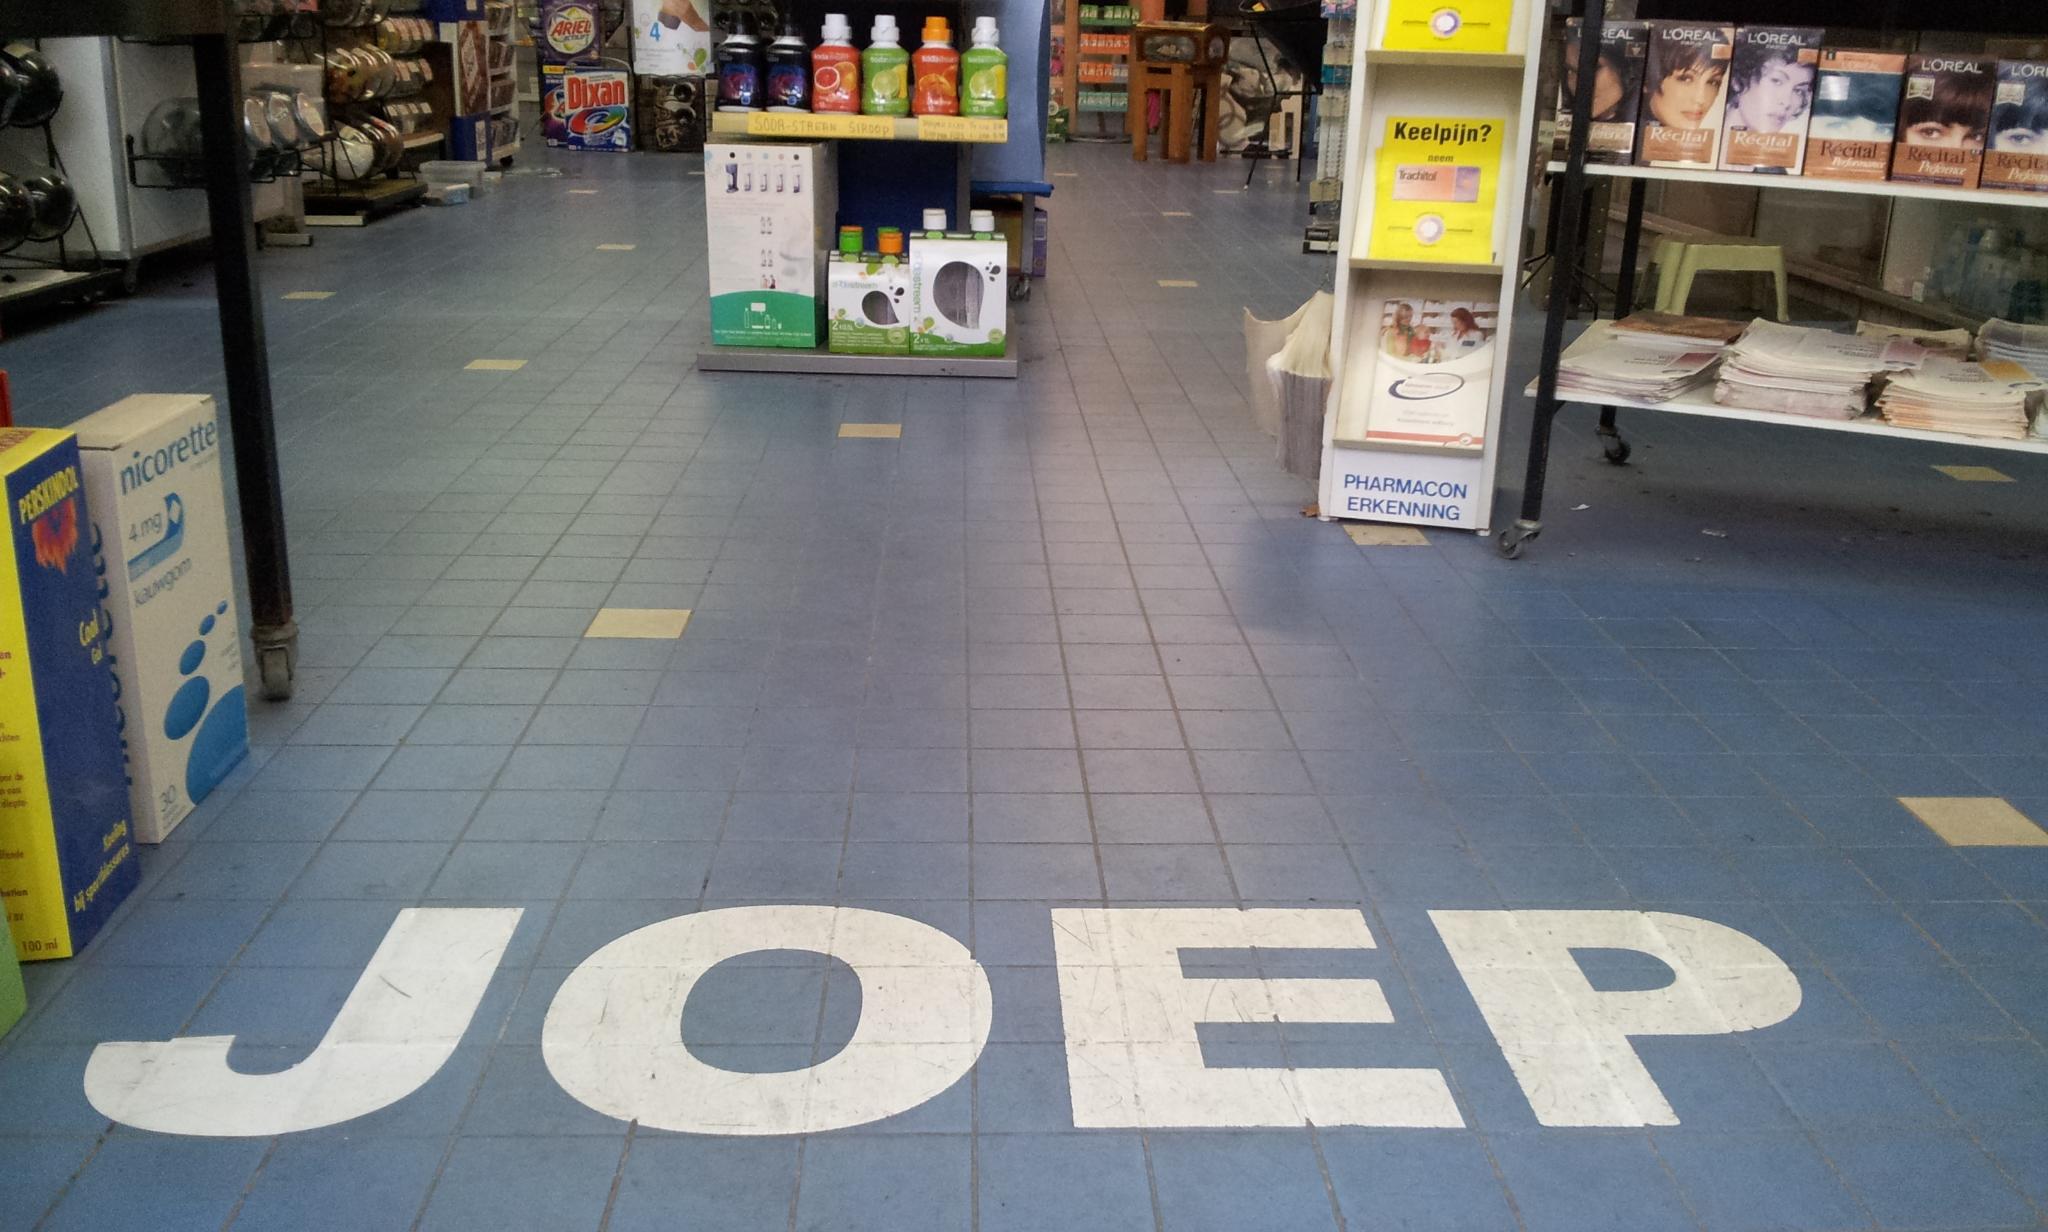 Joeop naam op vloer